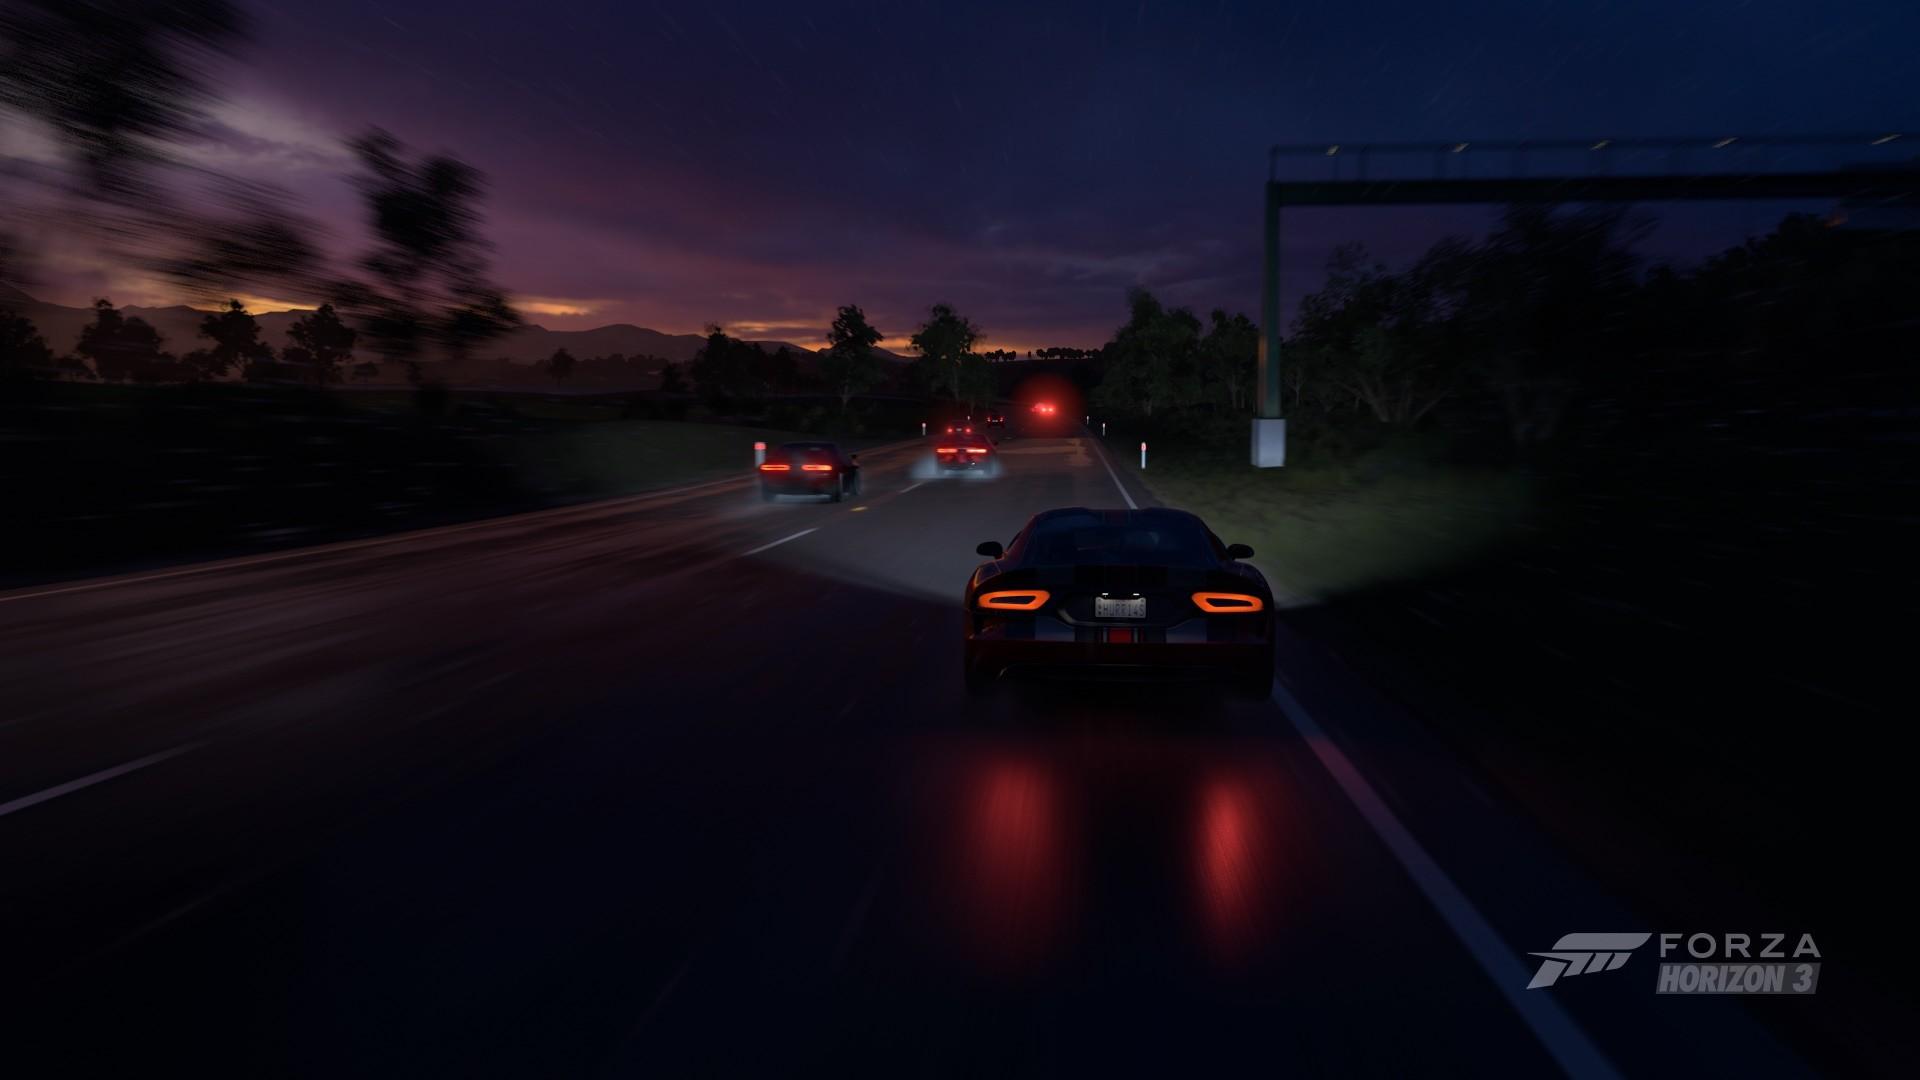 Super Cars 3d Wallpapers Forza Horizon 3 Car Supercars Sports Car Night Srt